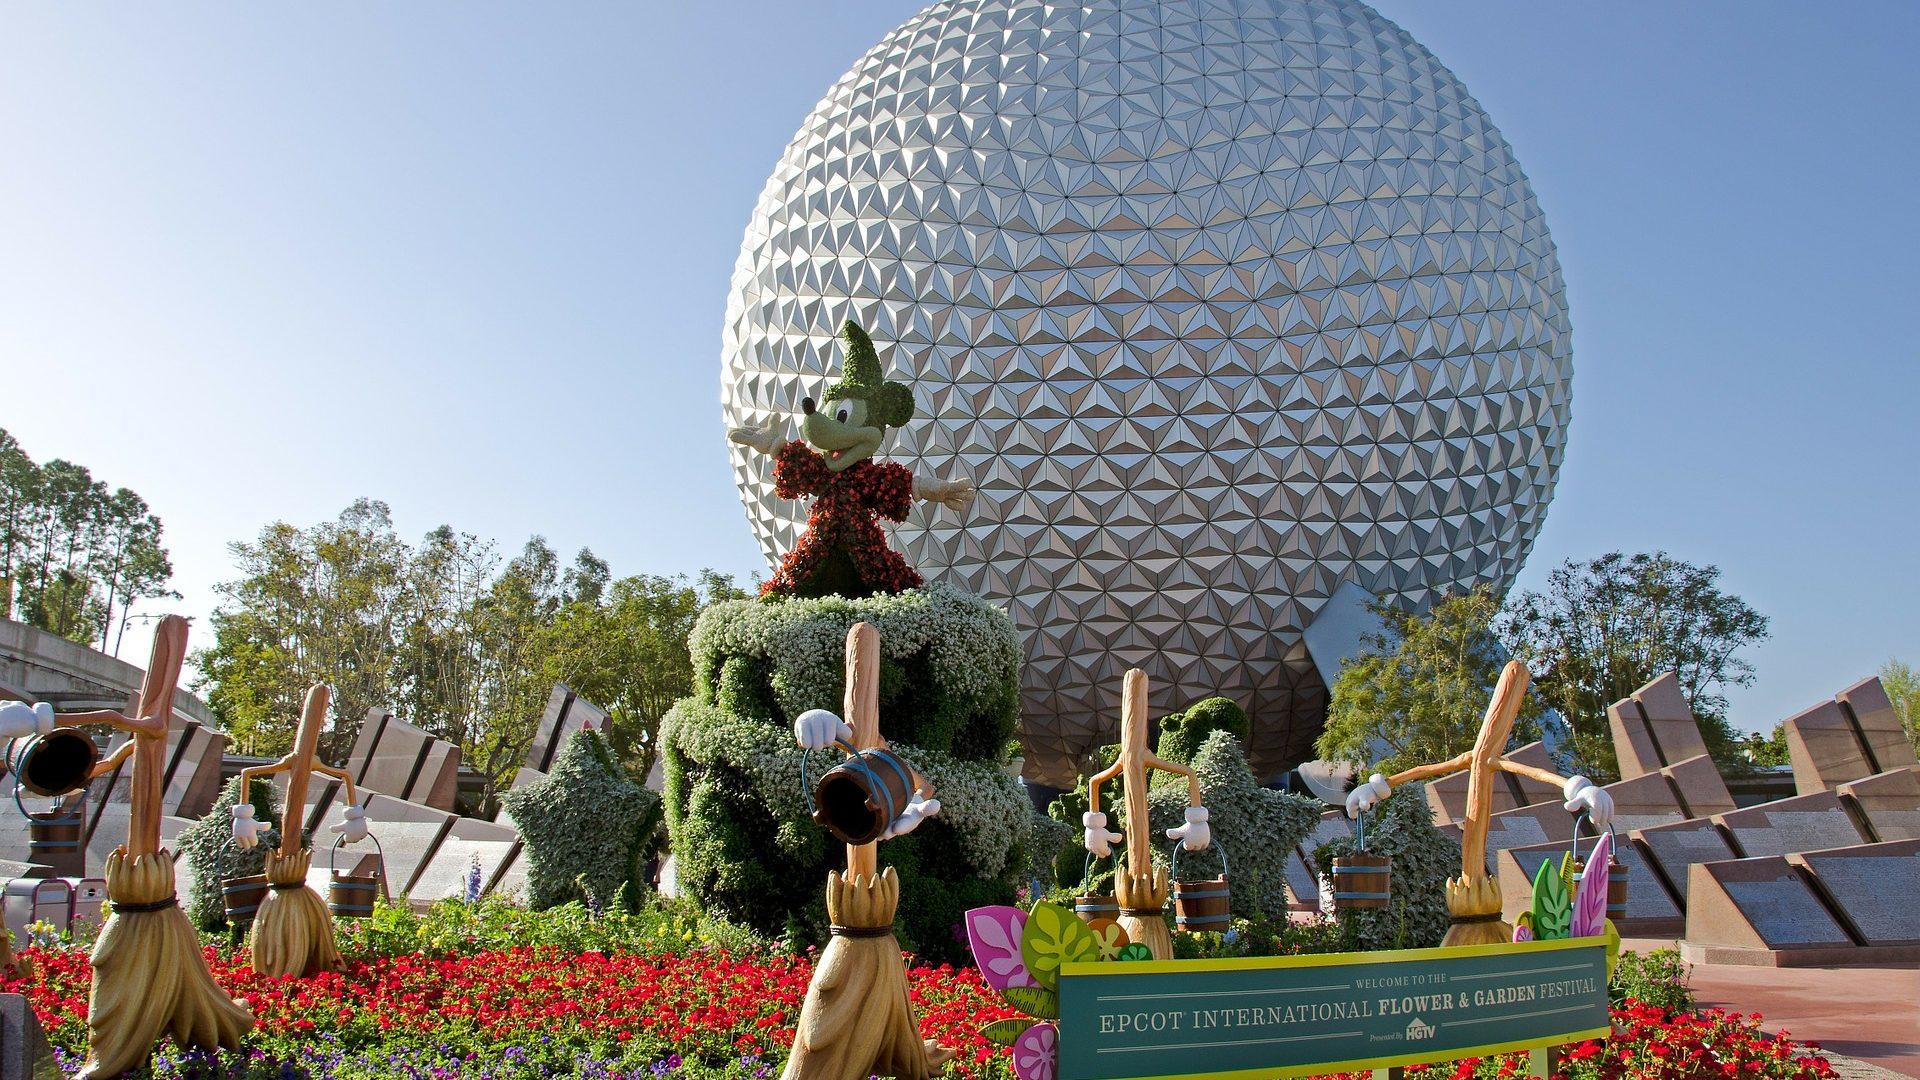 Epcot Center at Disney World